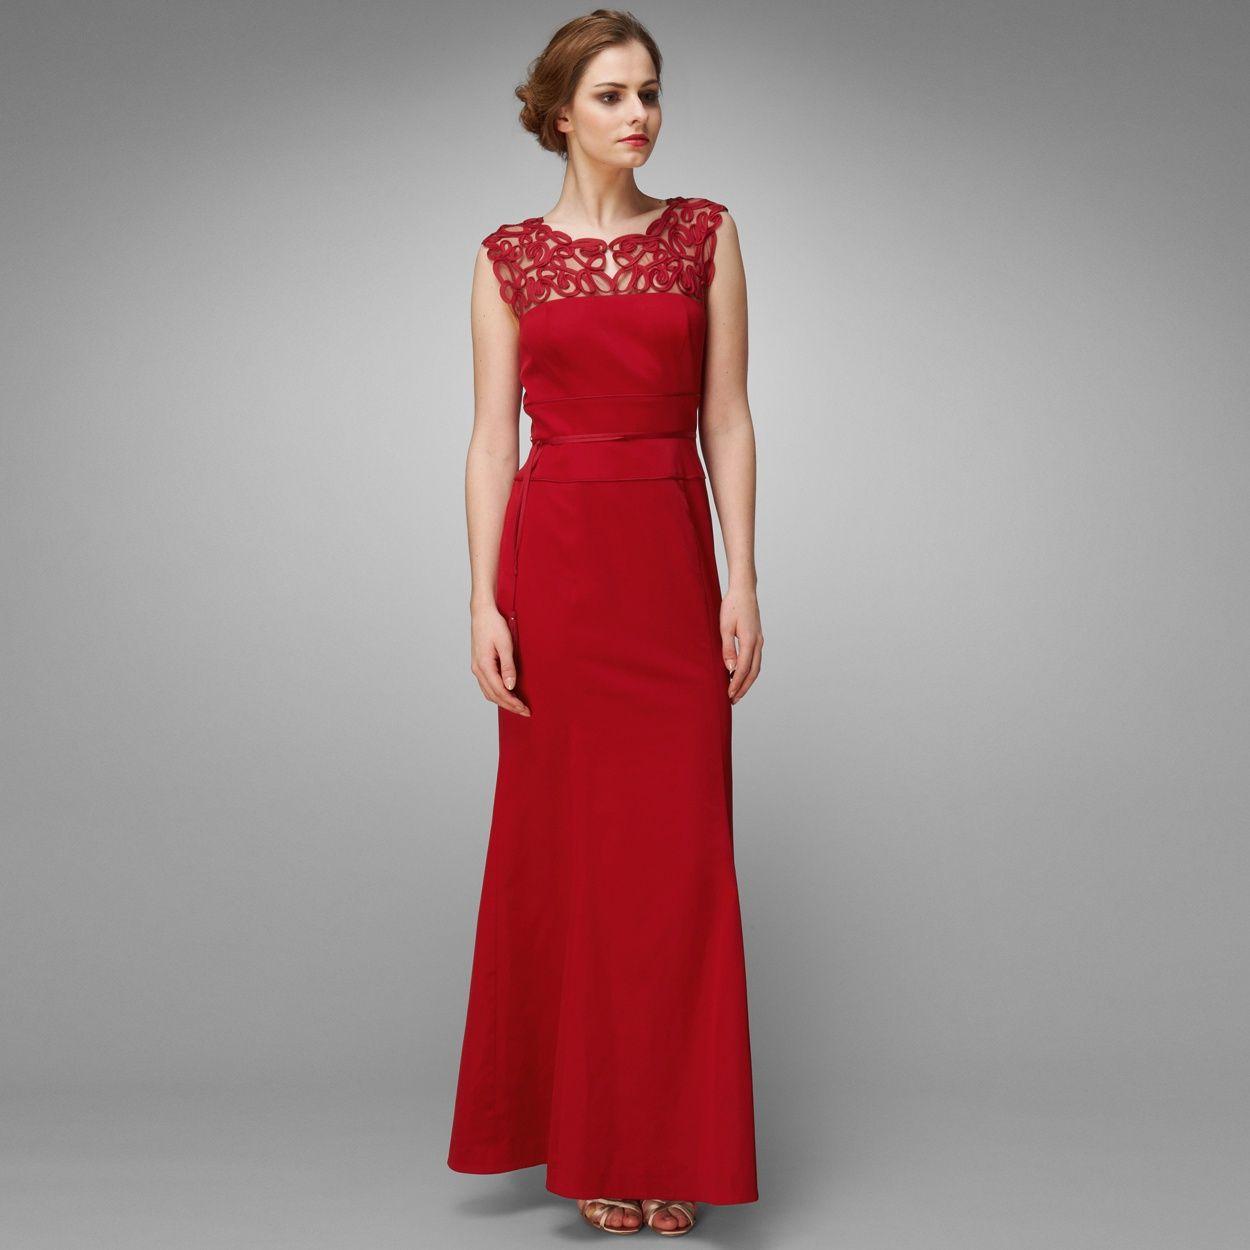 Phase Eight Ruby isabella full length dress- at Debenhams.com ...